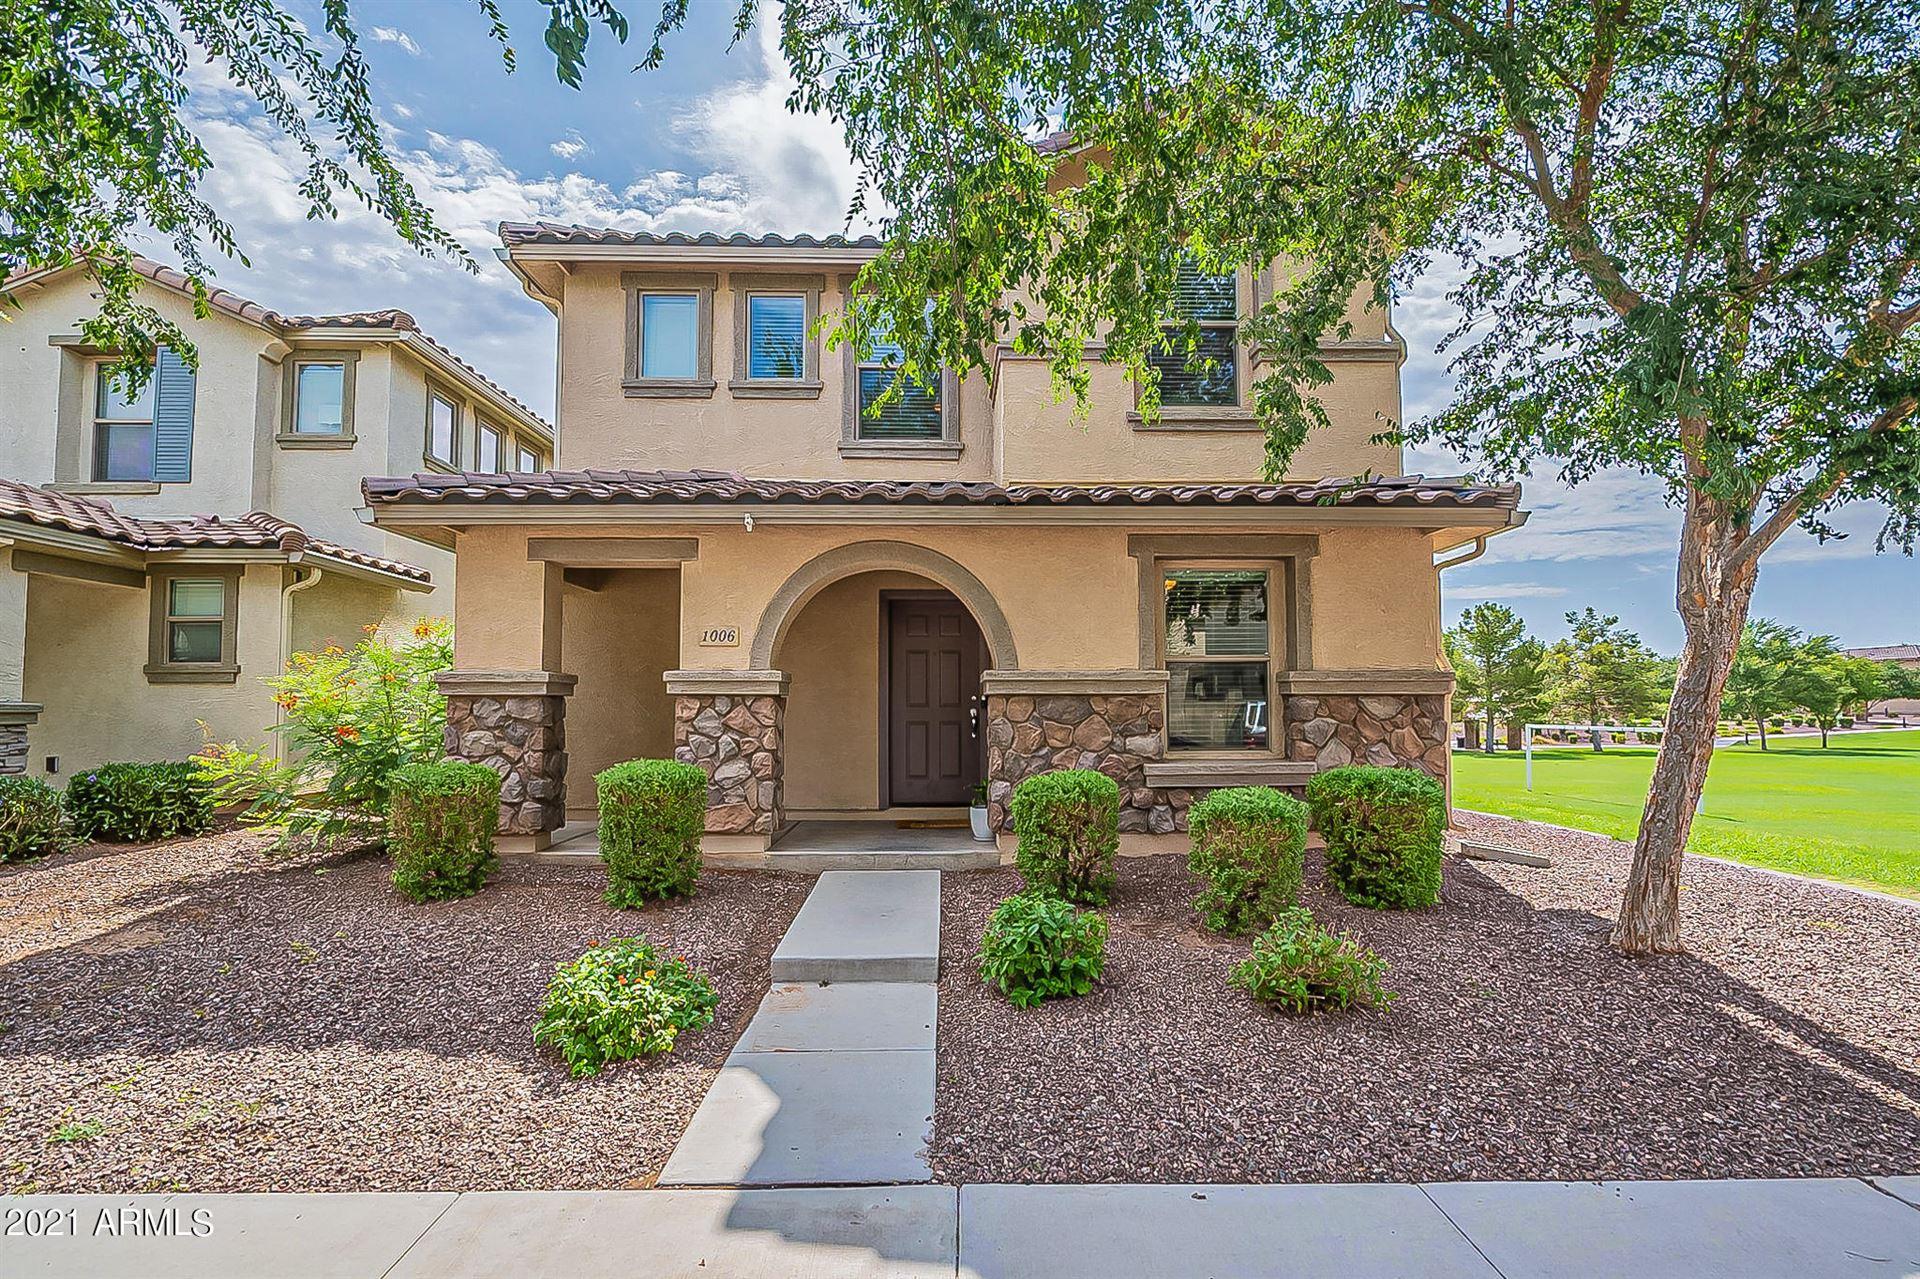 Photo of 1006 S SABINO Drive, Gilbert, AZ 85296 (MLS # 6266307)